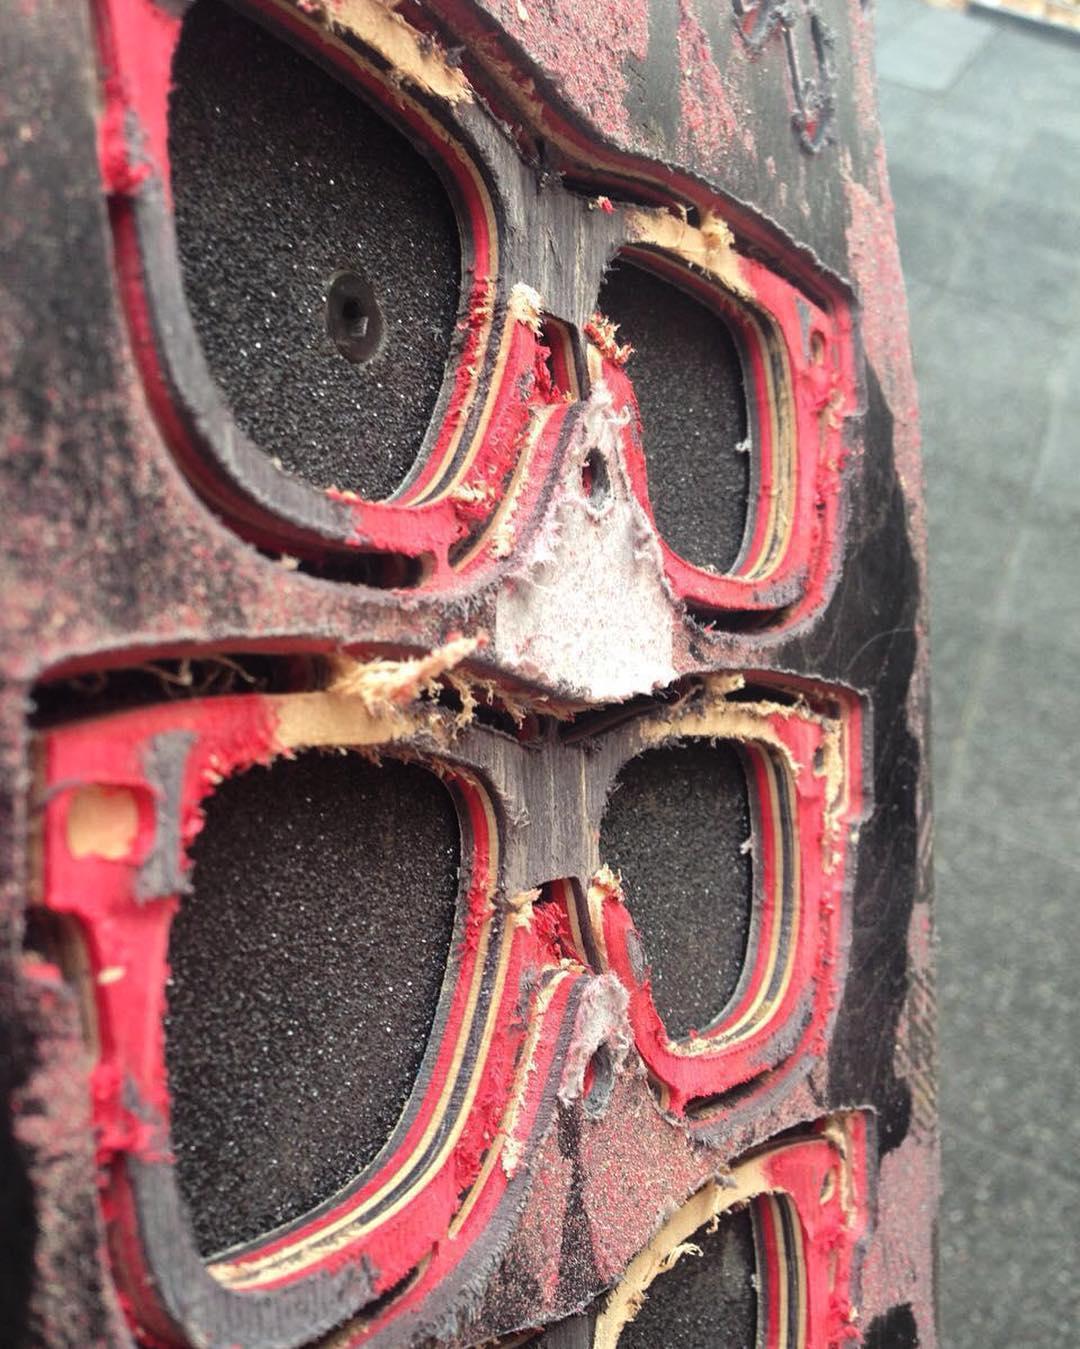 Boards details !!! ---------Board: @elementbrand  Promodel: @nick_garcia  User: @sebafrancoskate  #skate #recycledwood #skateboarding  #skateboards #recycledsunglasses #skateart #sunglasses #recycled